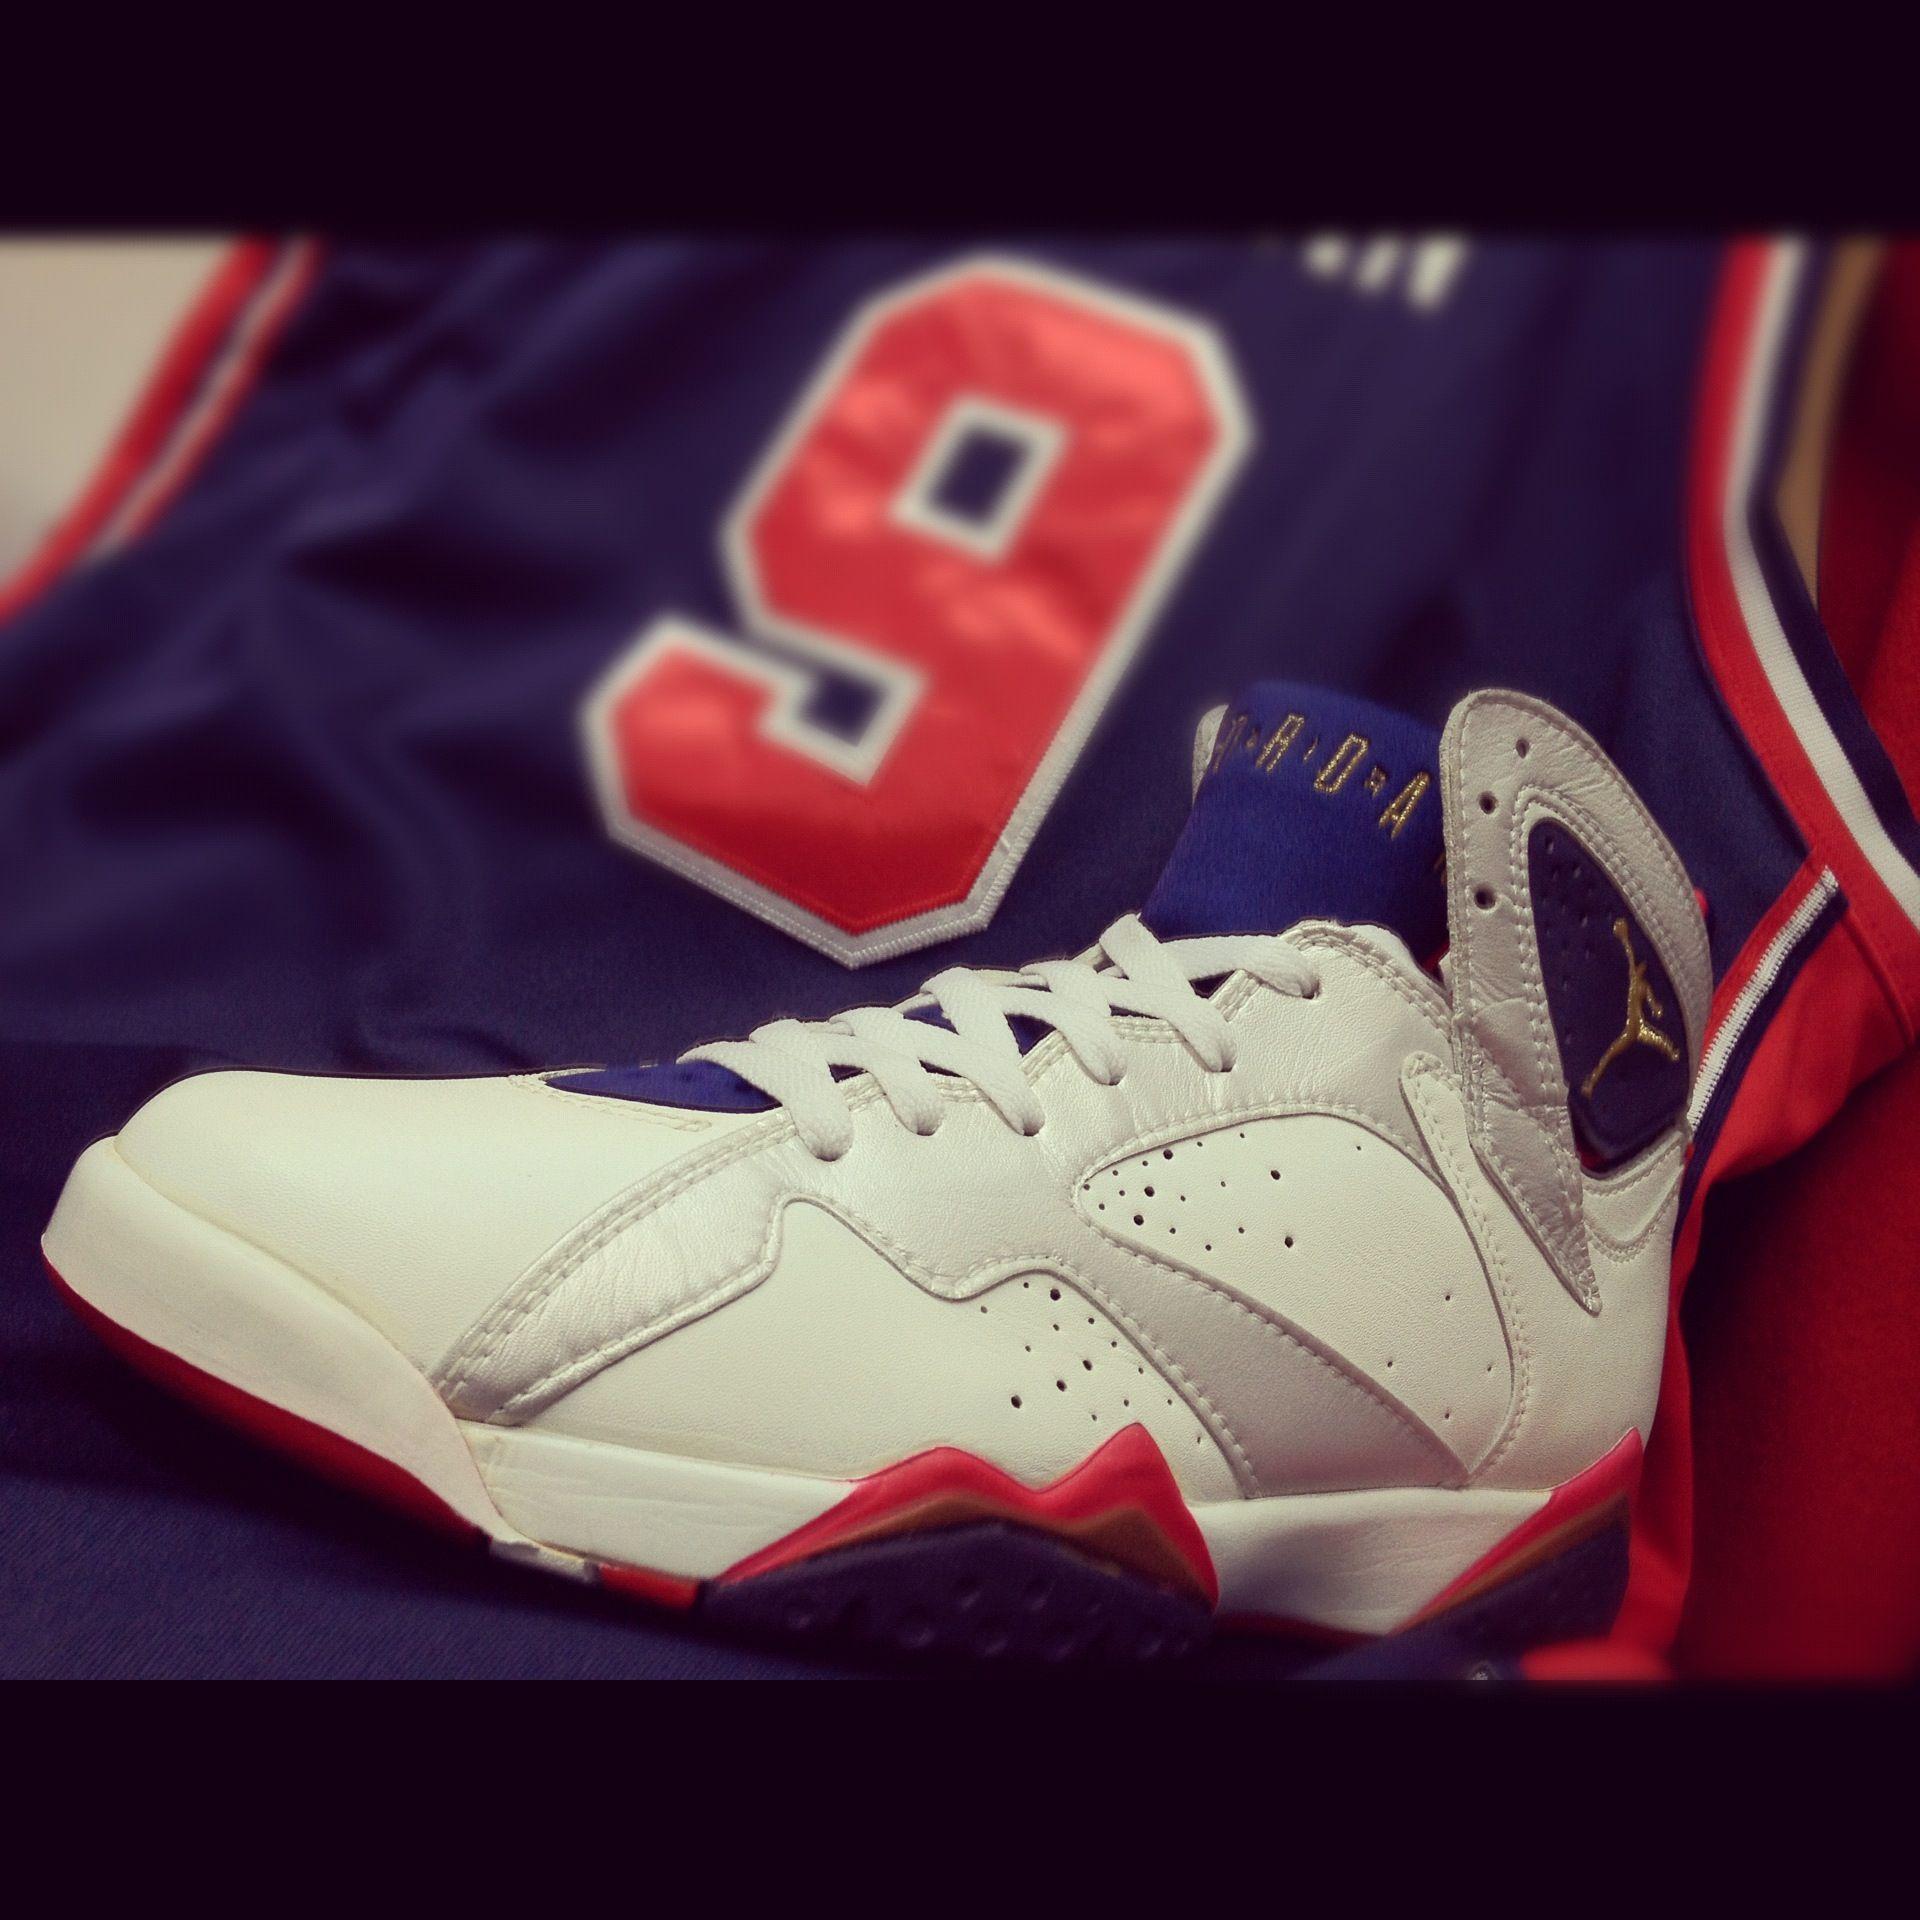 jordan logo with many jordan shoes http://www.shoeslong.com/buy-jordan -basketball-shoes-for-men_c570/ | Cool stuff | Pinterest | Jordans  basketball shoes, ...